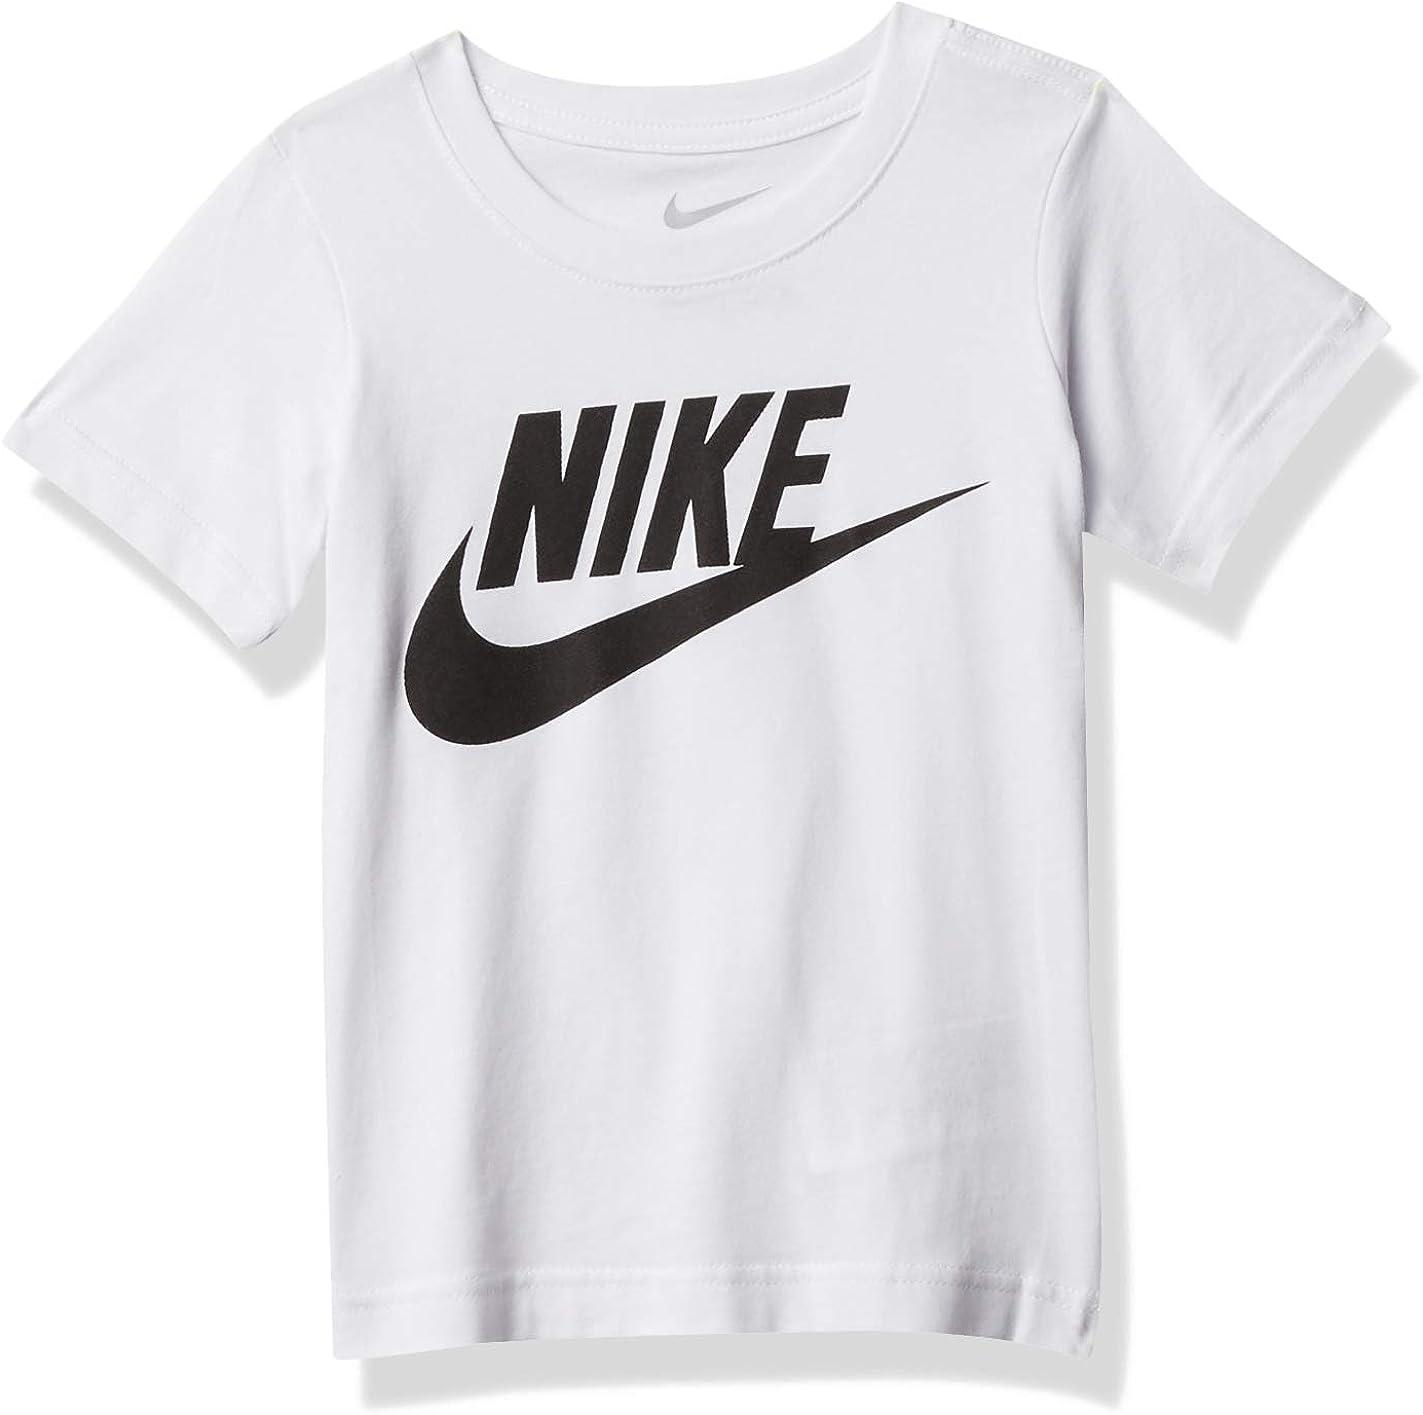 Nike Kids Baby Boy's Short Sleeve Graphic T-Shirt (Toddler)